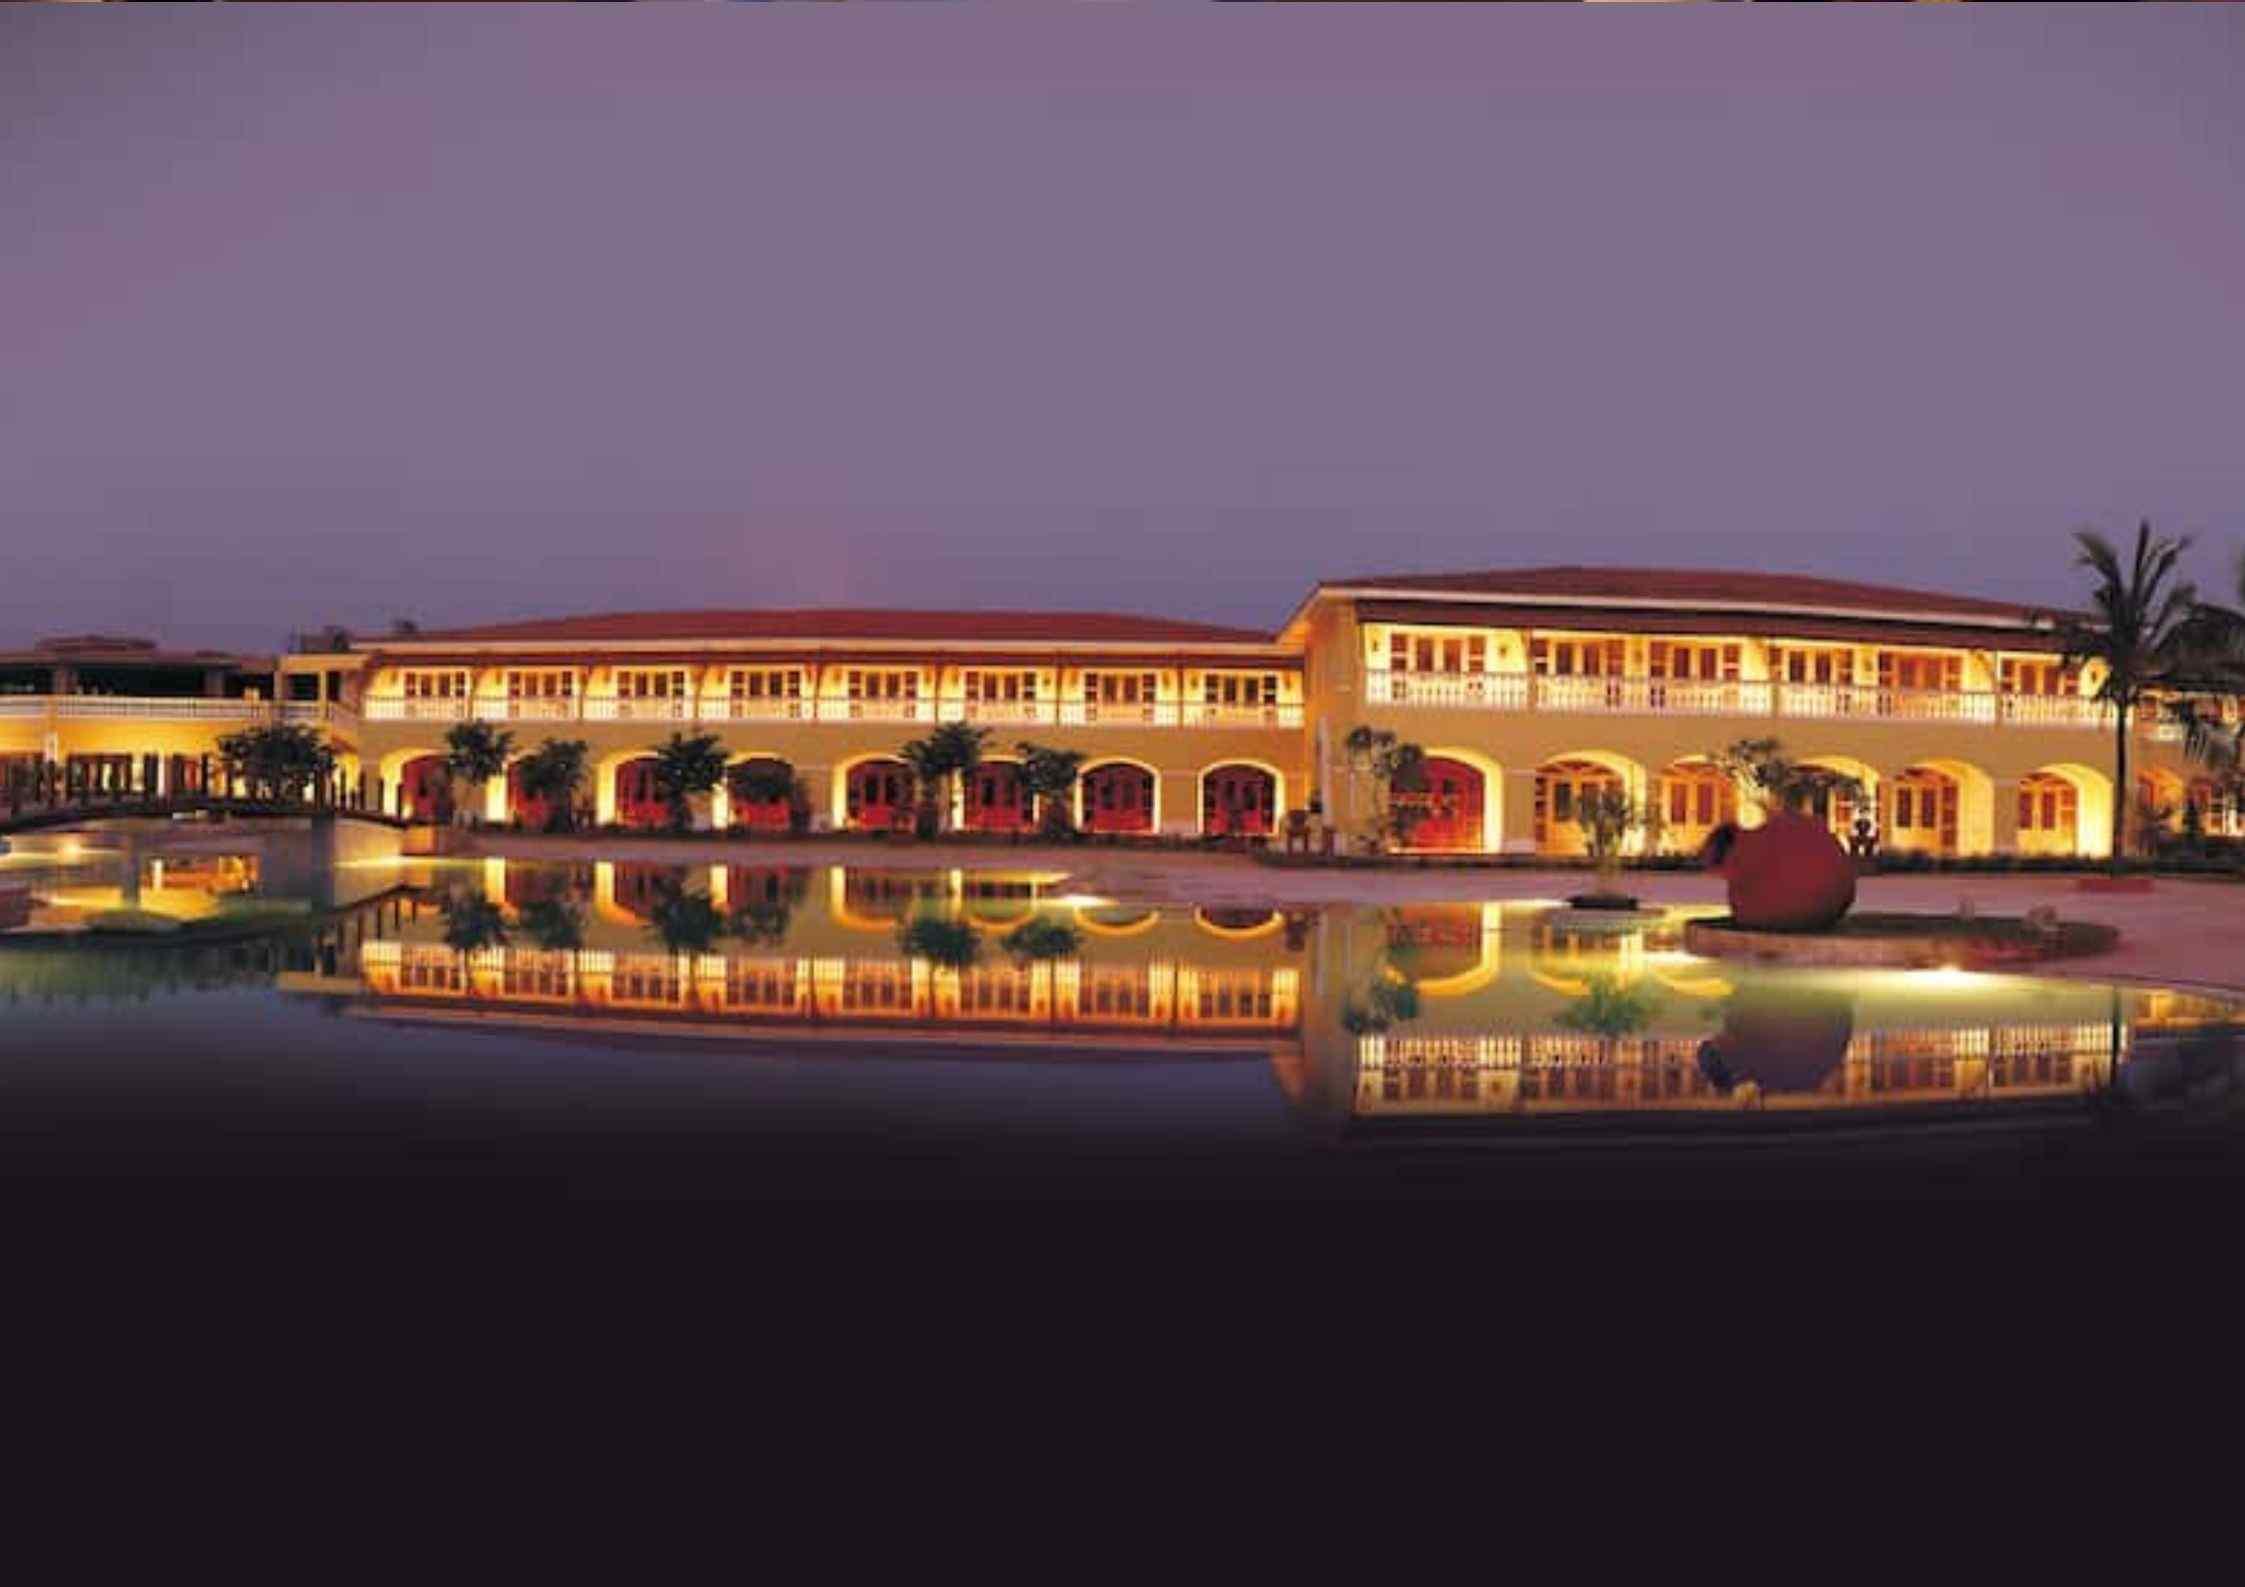 The Lalit Golf, Spa Resort Goa